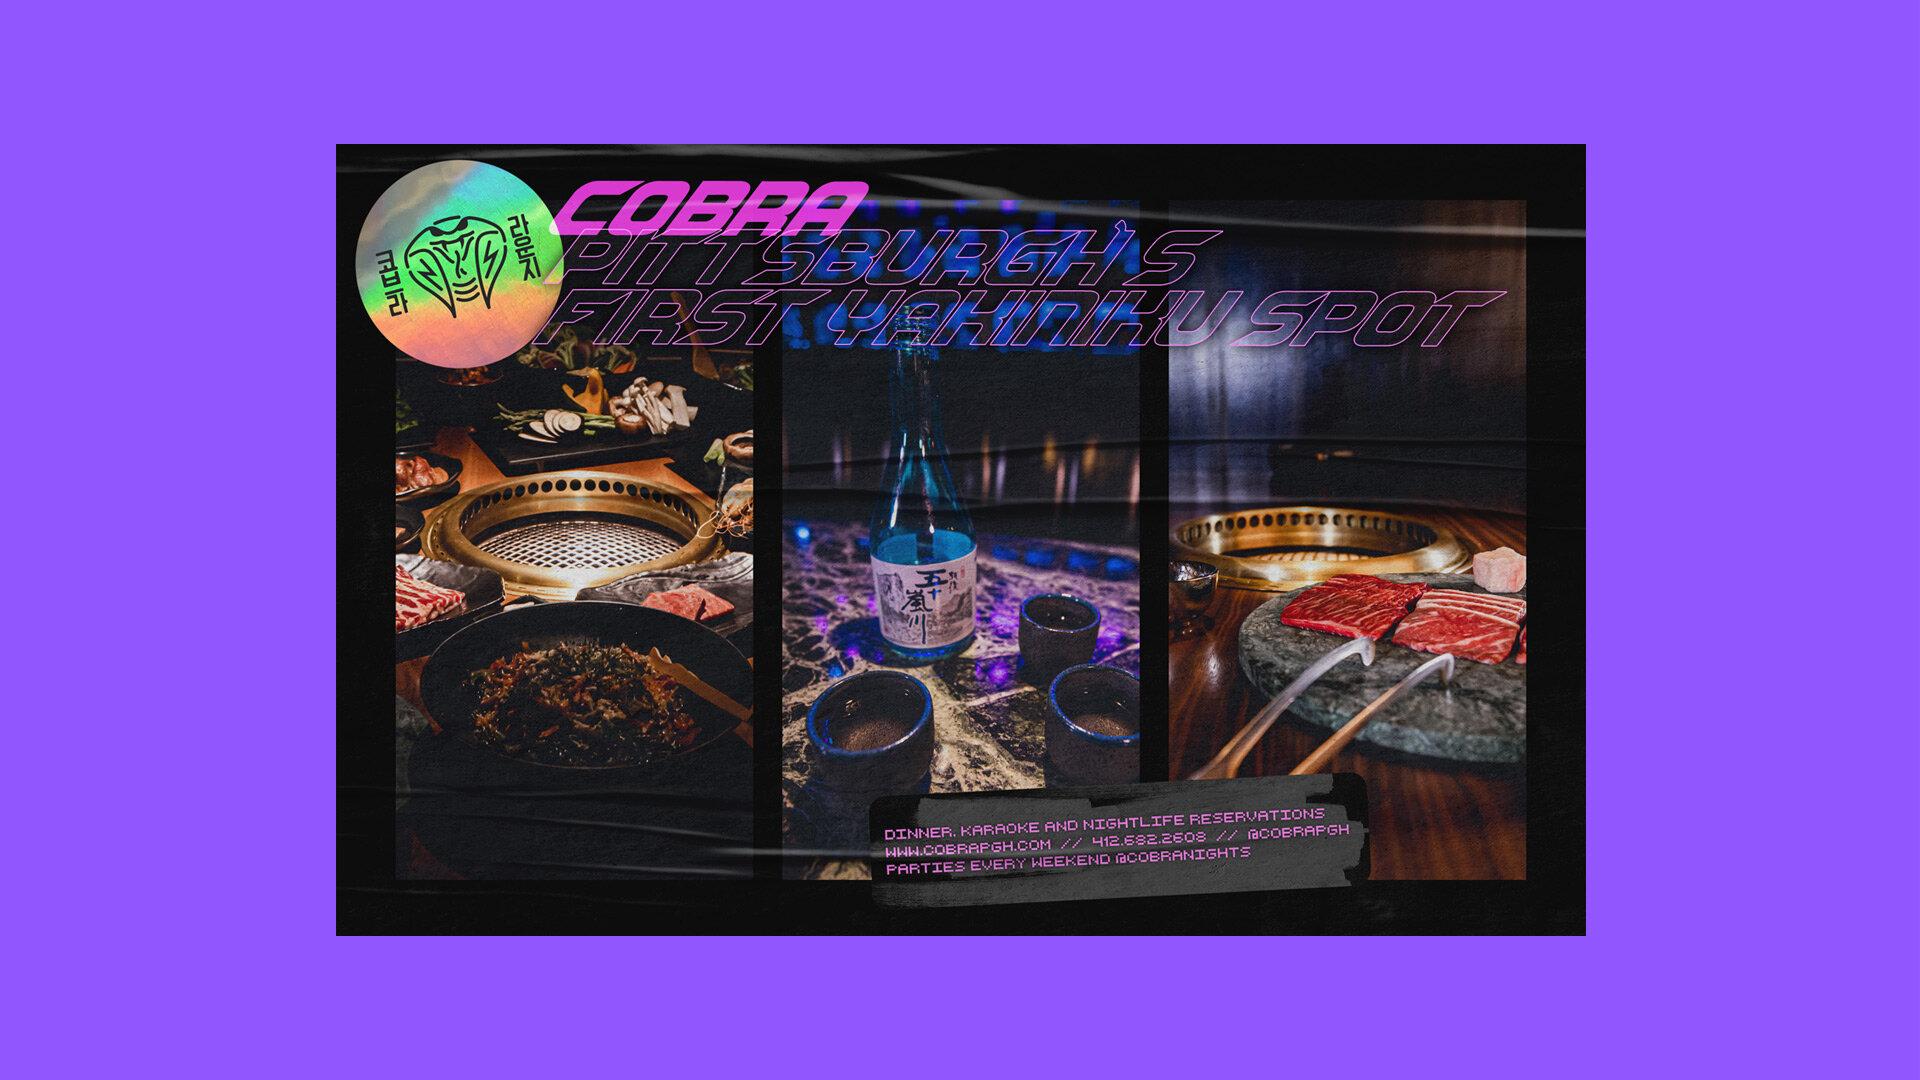 Cobra_5-1